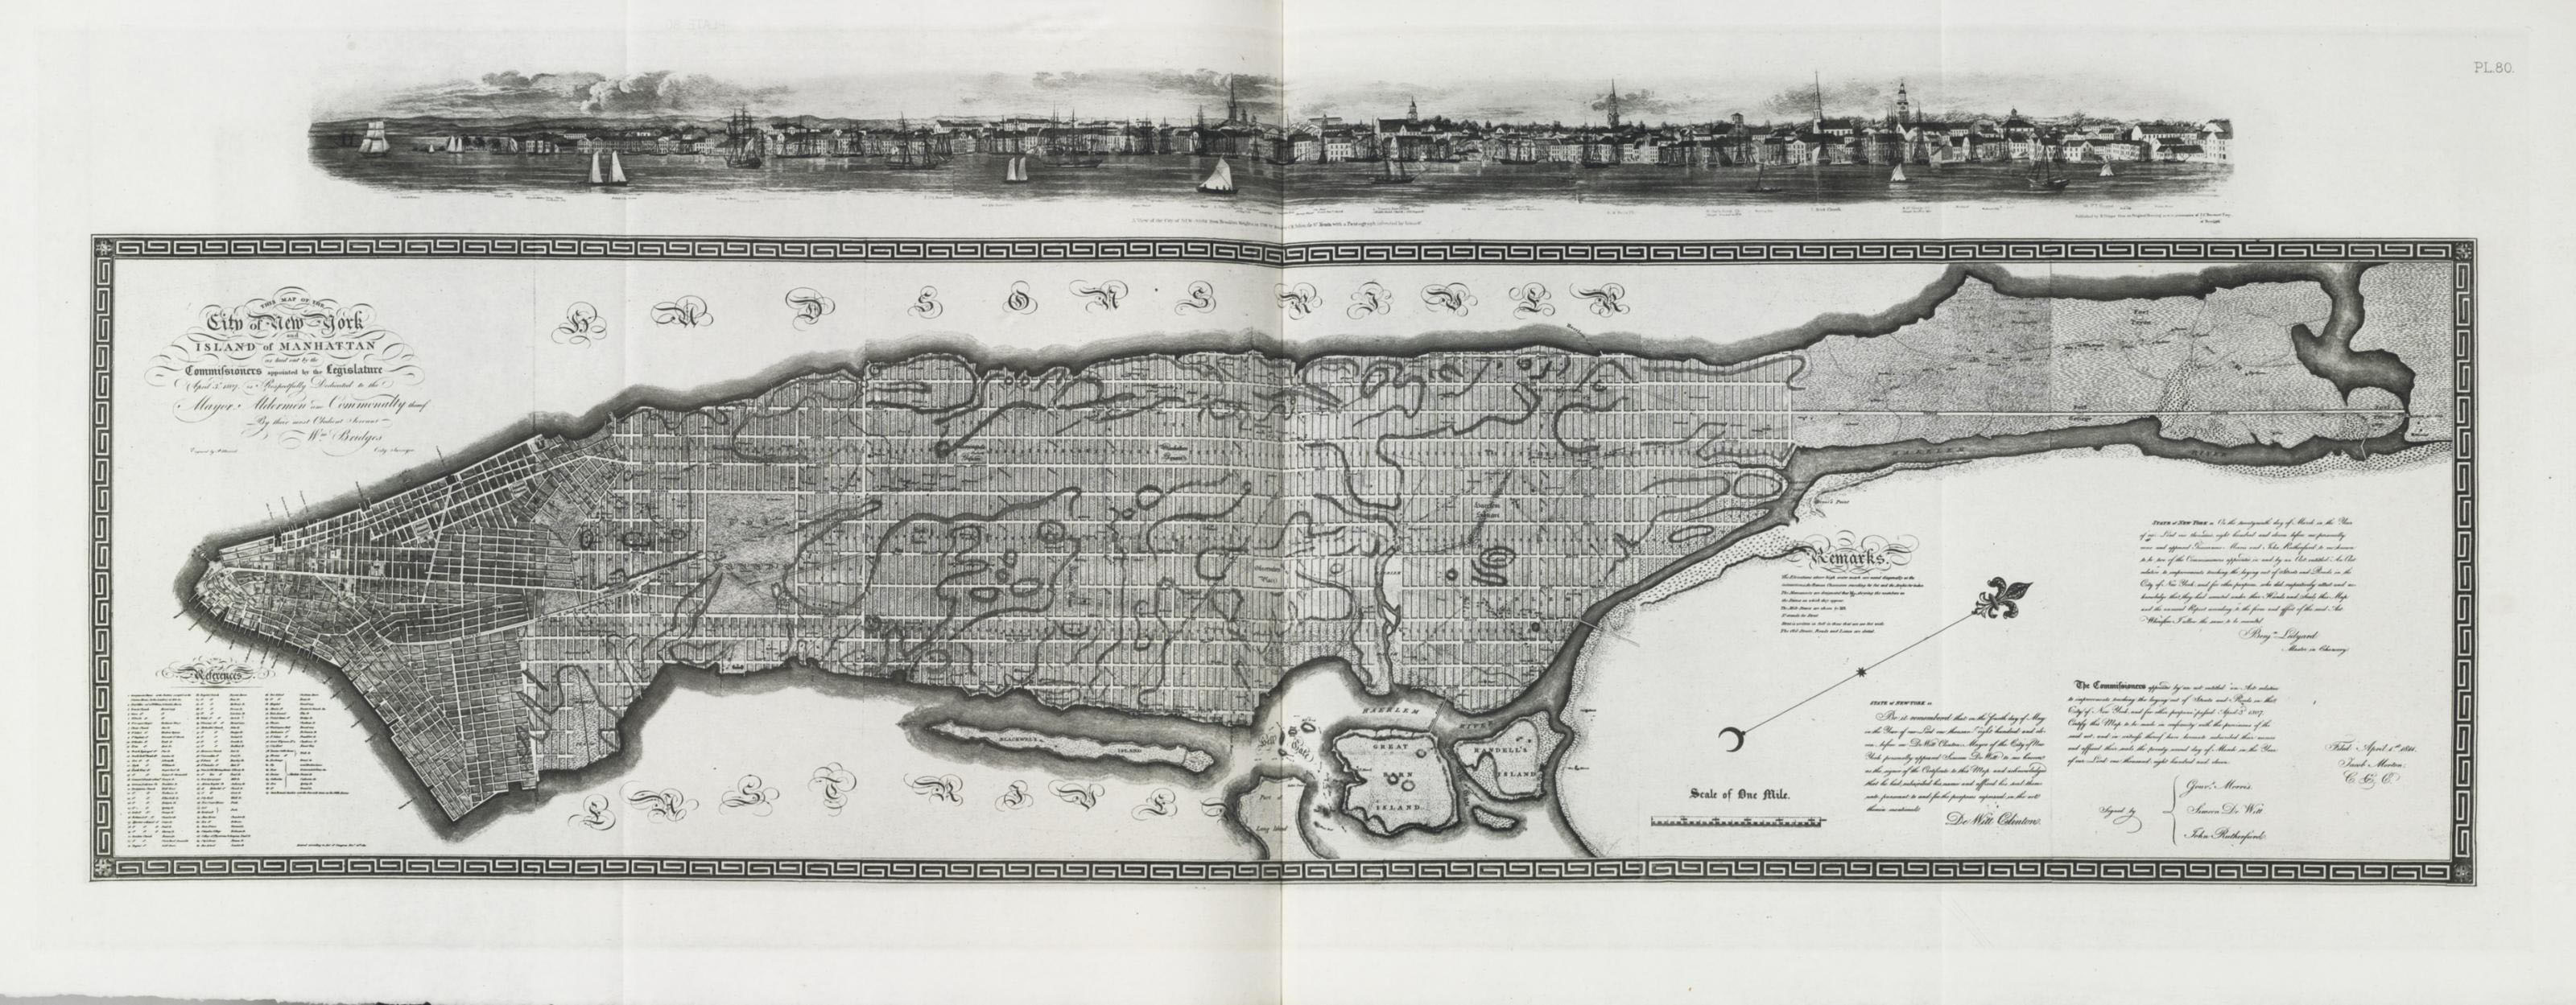 STOKES, Isaac Newton Phelps (1867-1944).  The Iconography of Manhattan Island.   New York: Robert H. Dodd, 1915-1928.